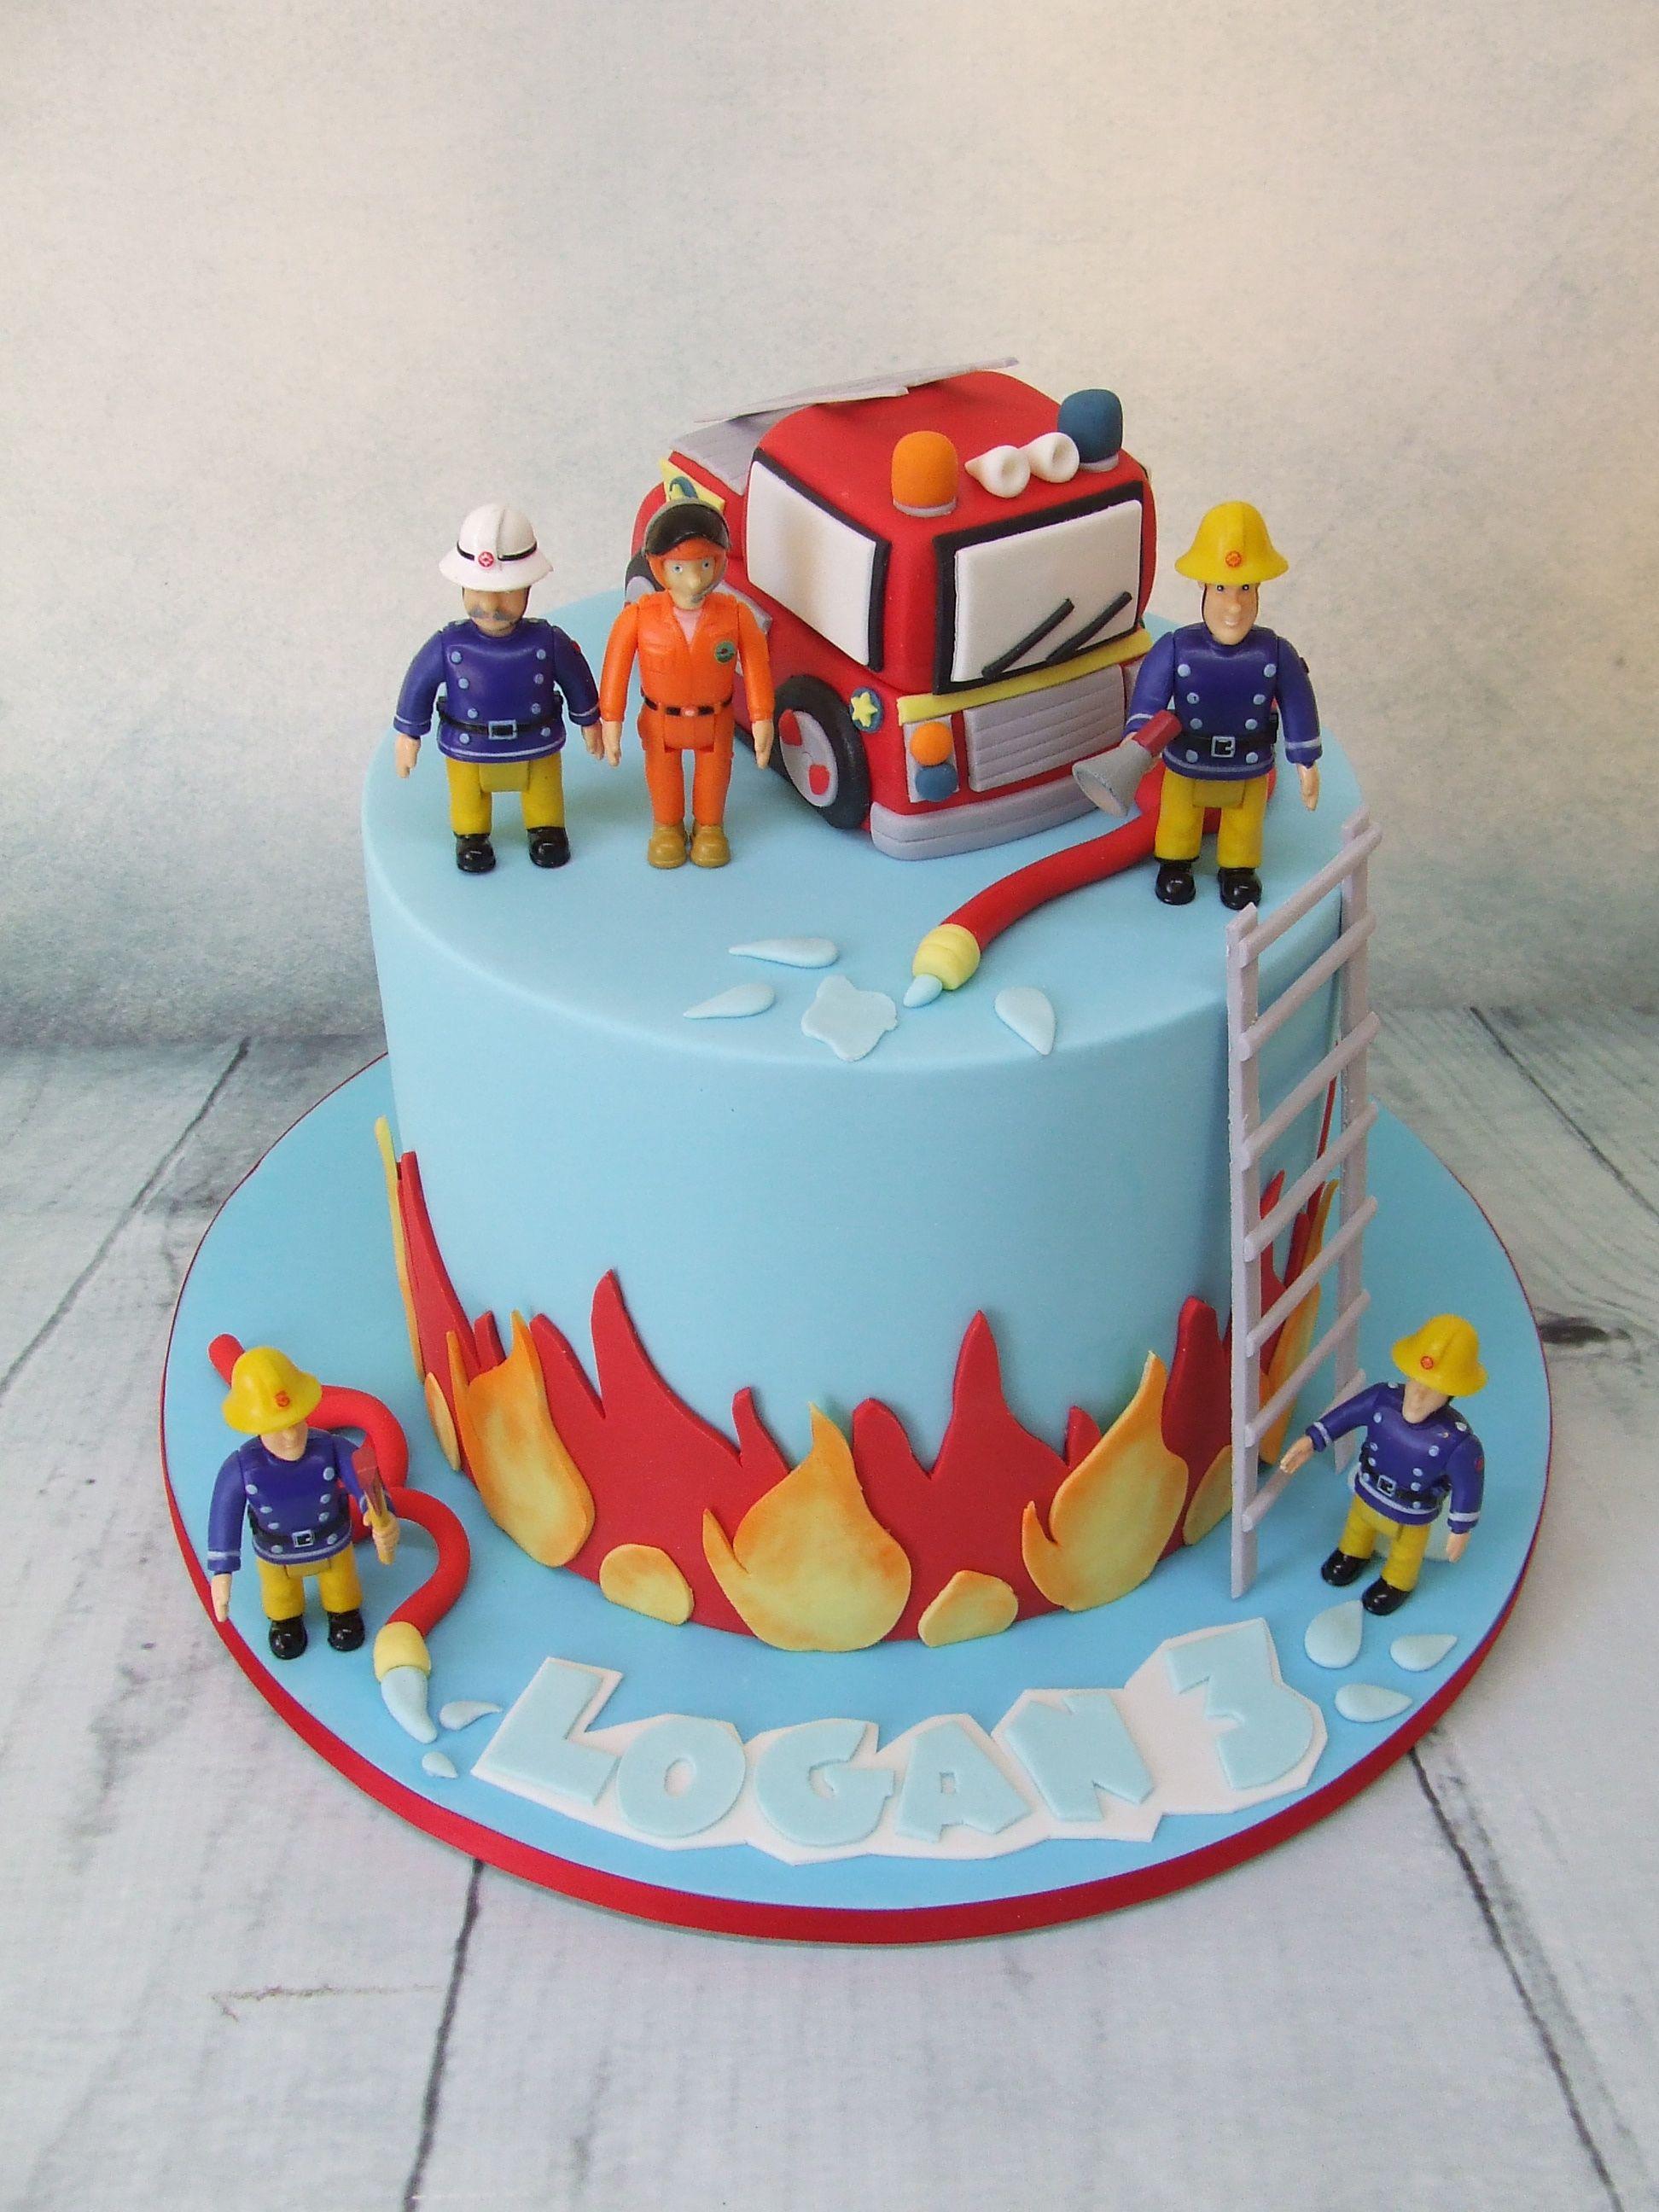 Pin By Brenda Lopez On Birthday Party Pinterest Fireman Sam Cake